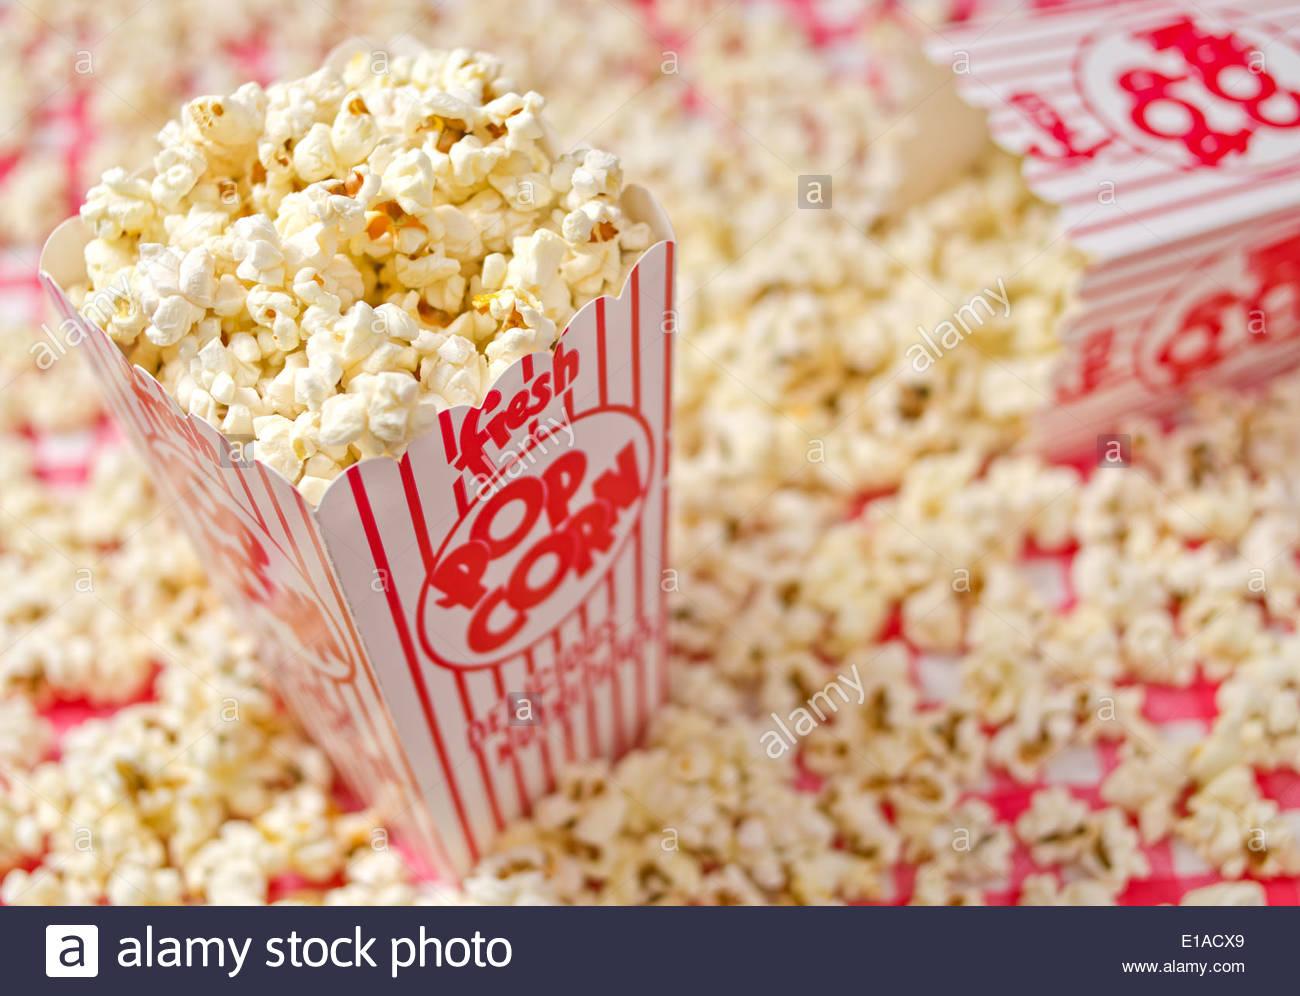 Freshly popped popcorn against a popcorn background Stock Photo 1300x996